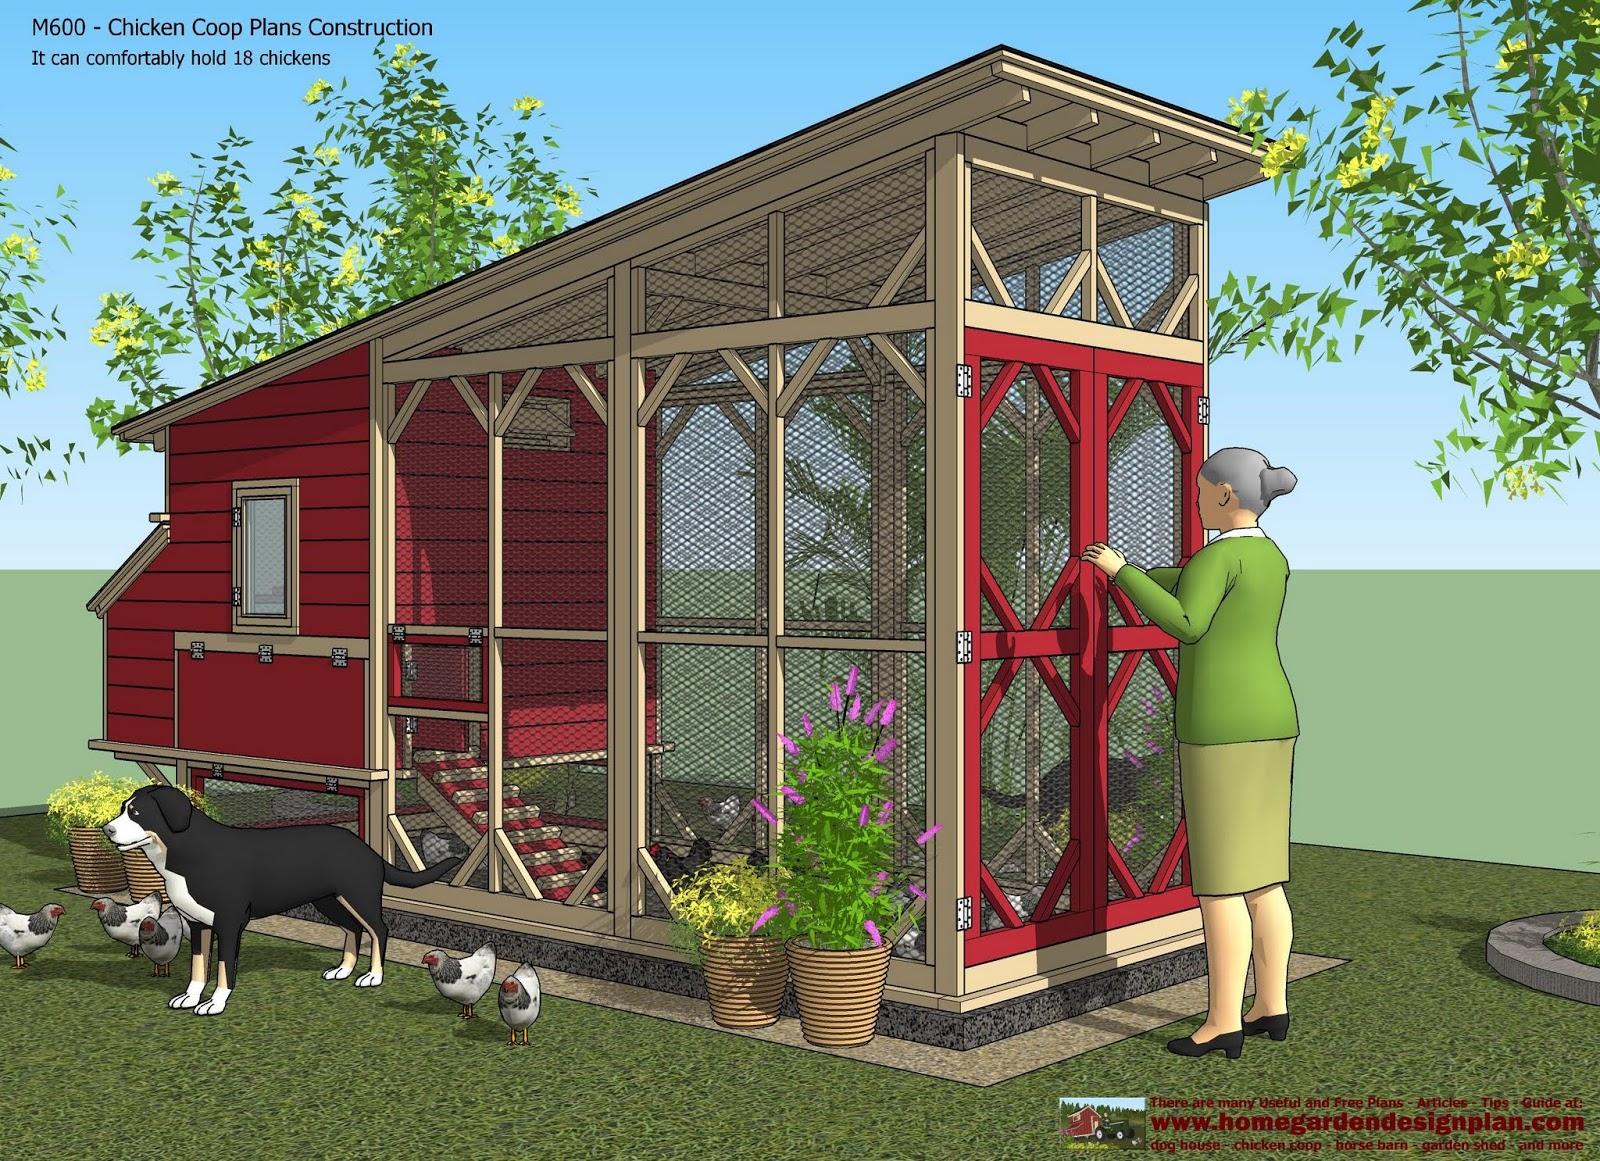 Chcken coop m600 chicken coop plans construction chicken for Coop house plans